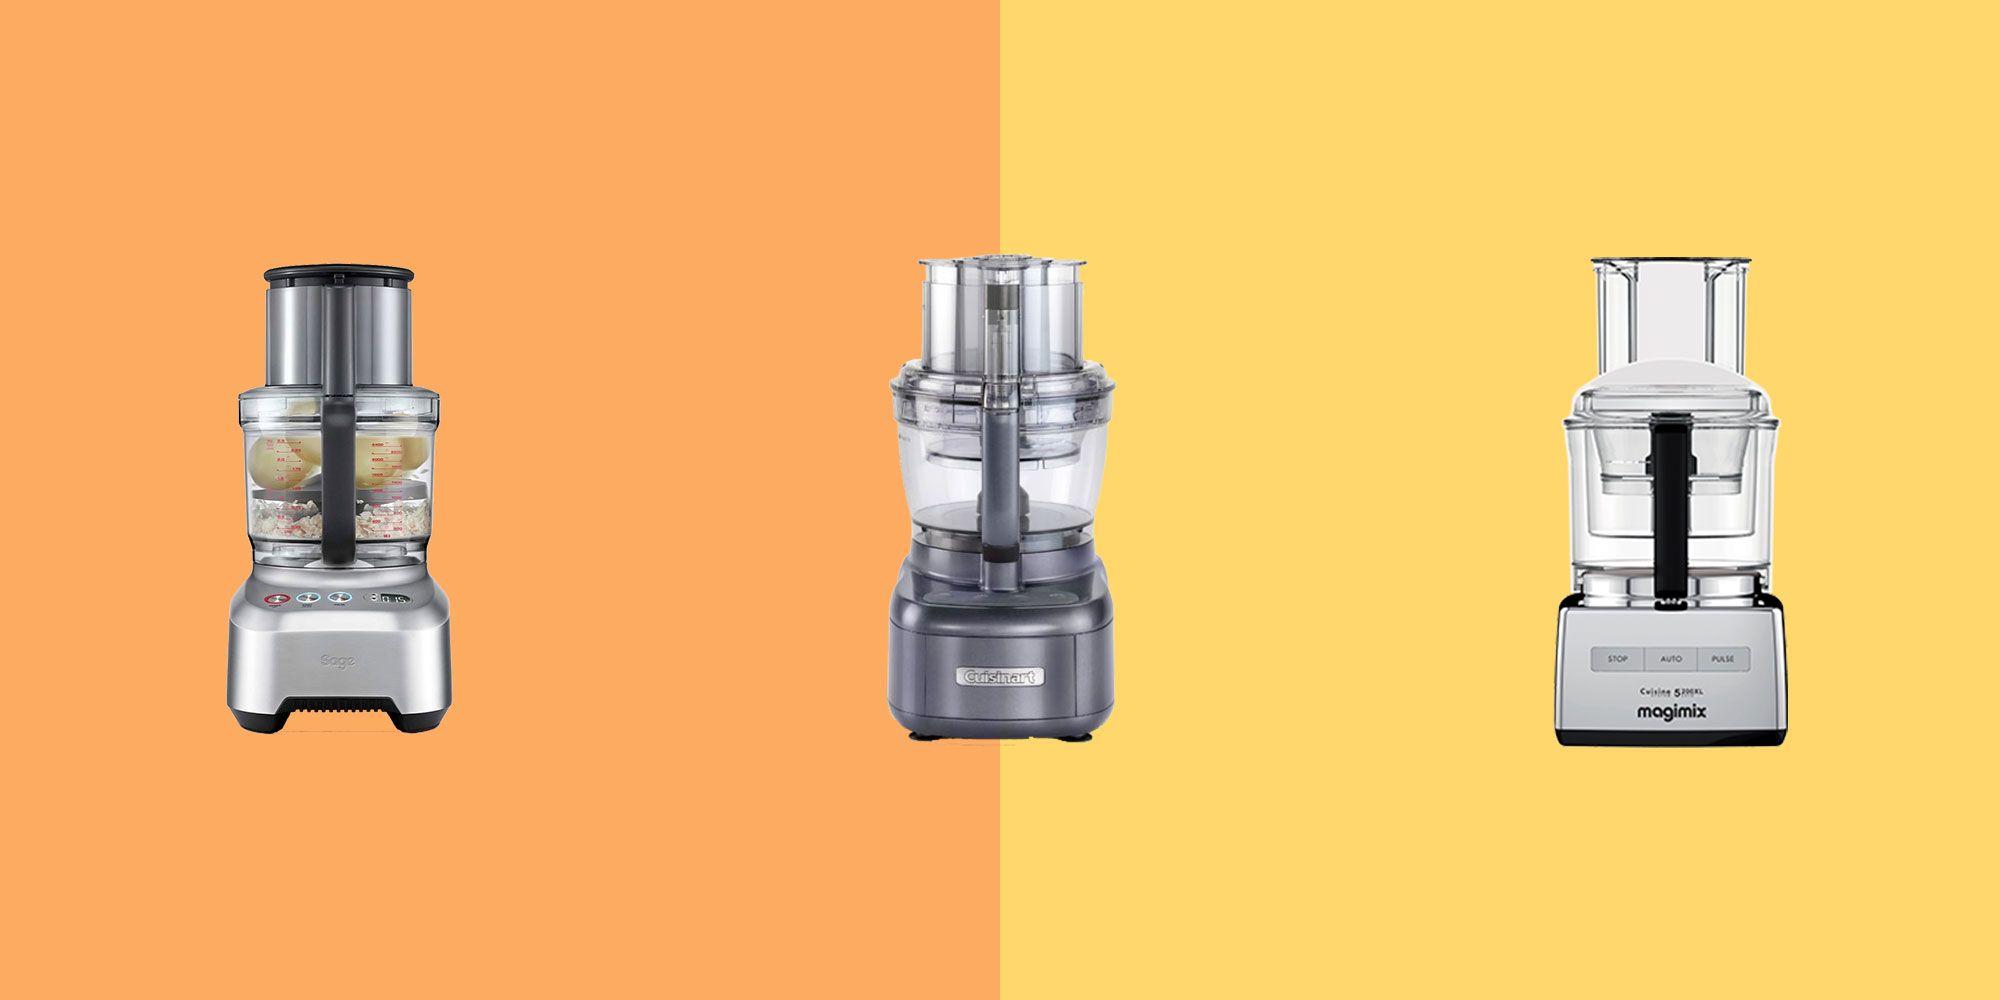 Bosch Citrus sqeezer with a Power of 25